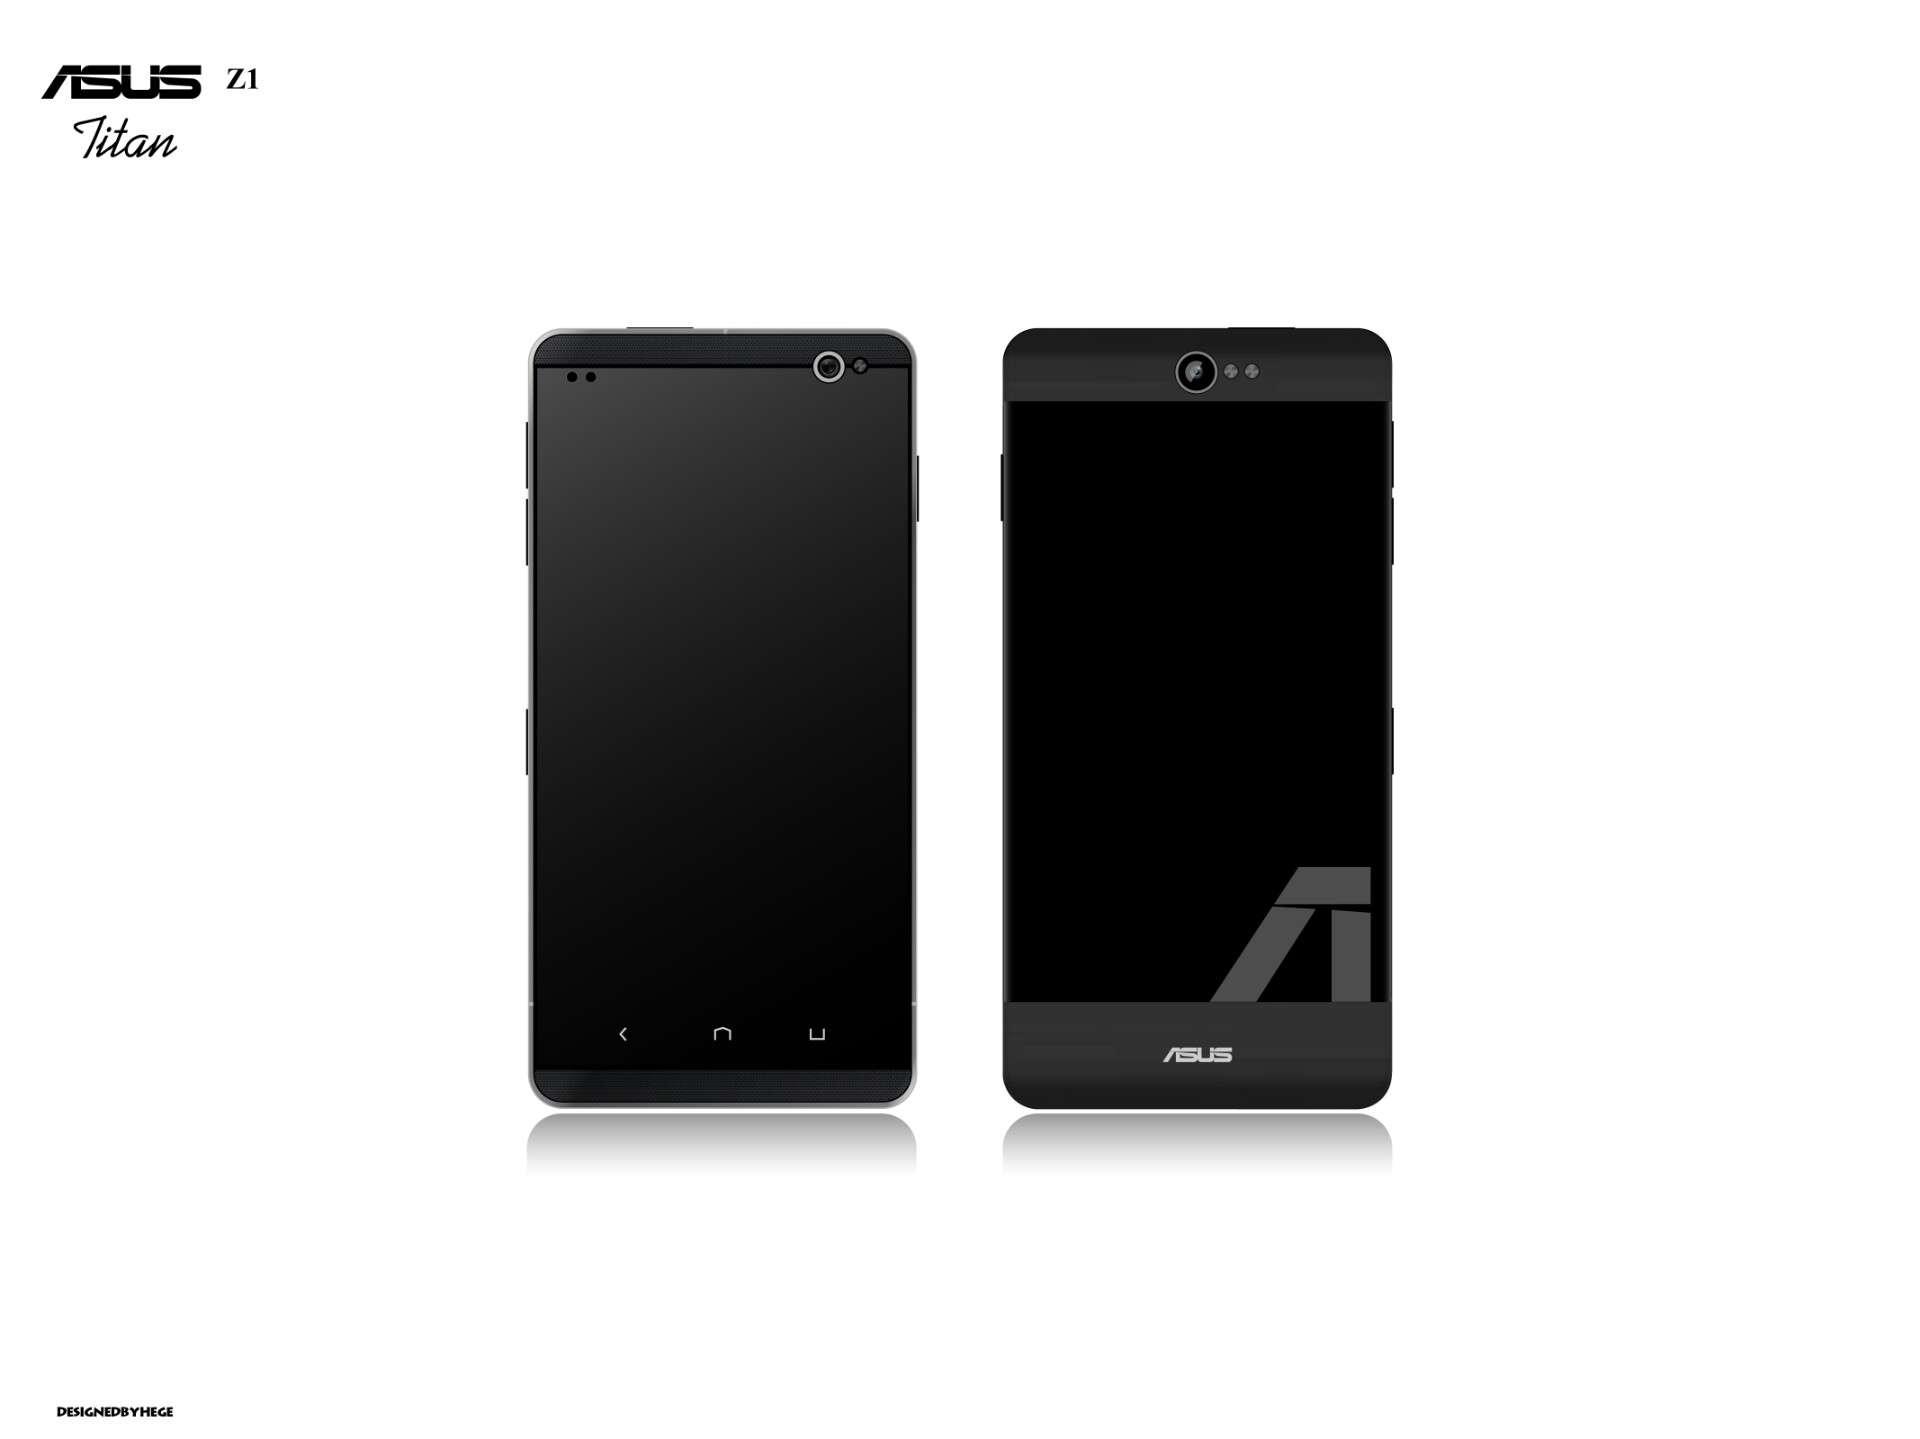 Asus Z1 Titan concept 2